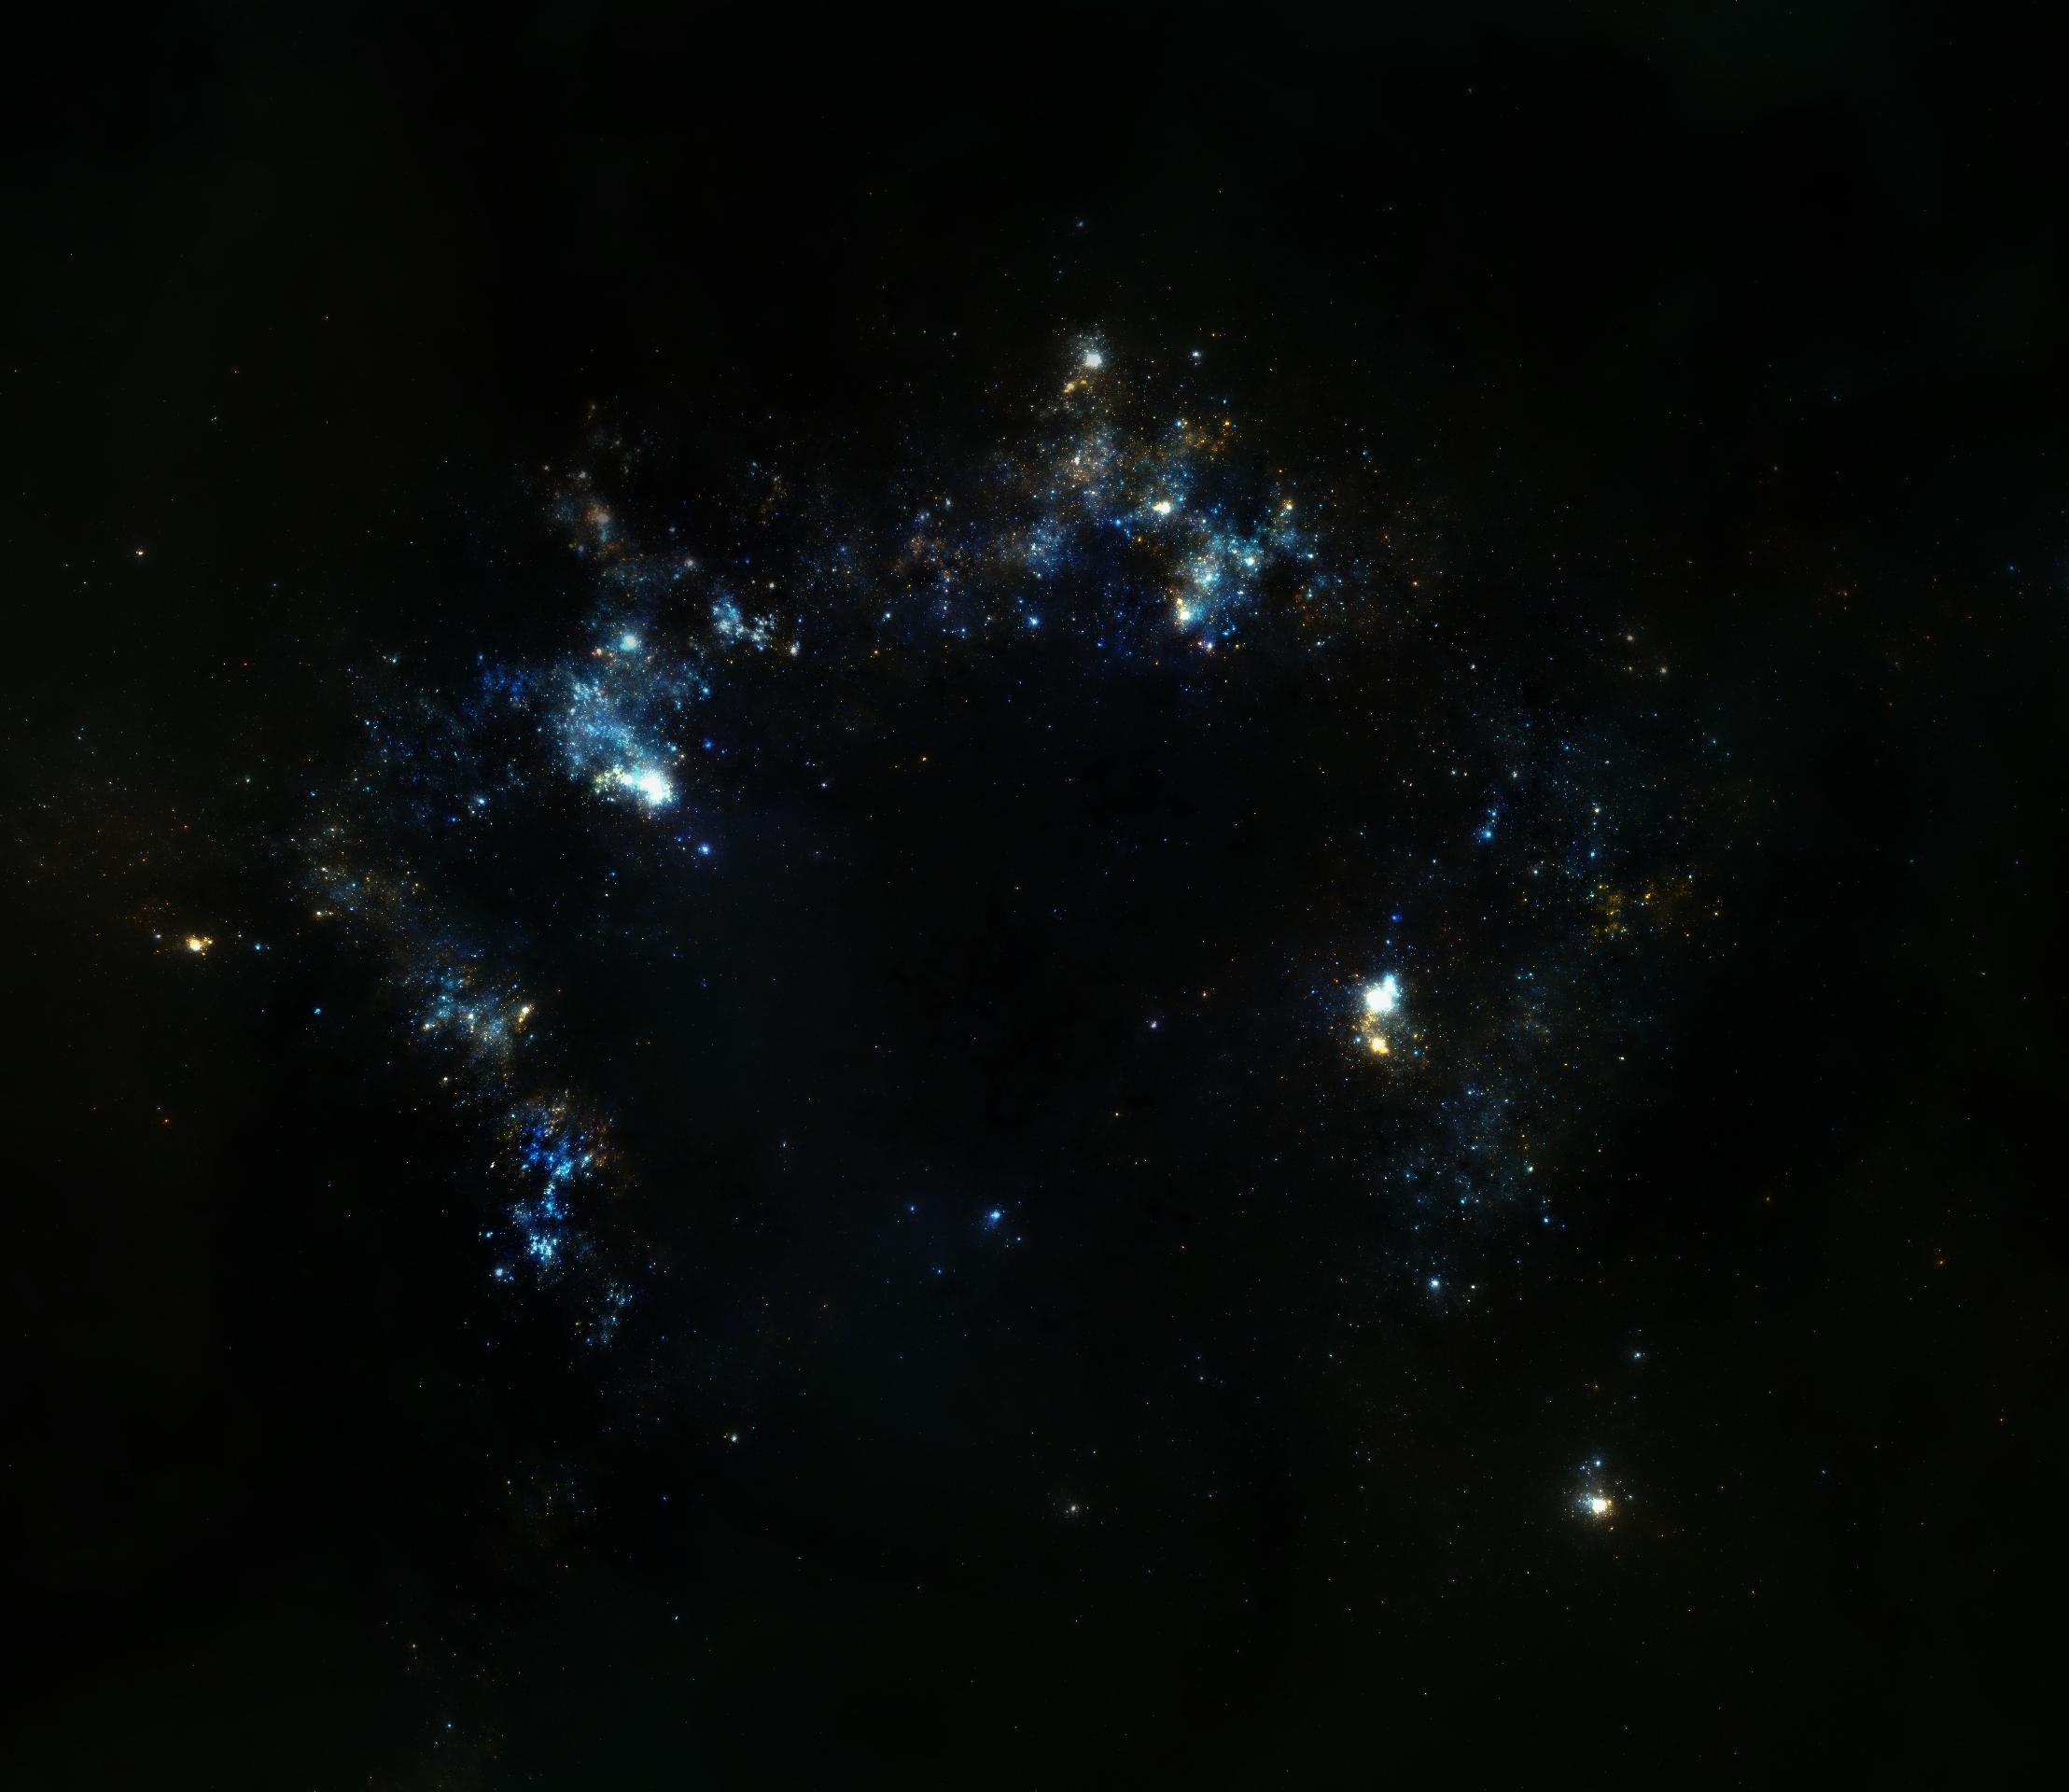 Celestial Background 49 By Frostbo On Deviantart